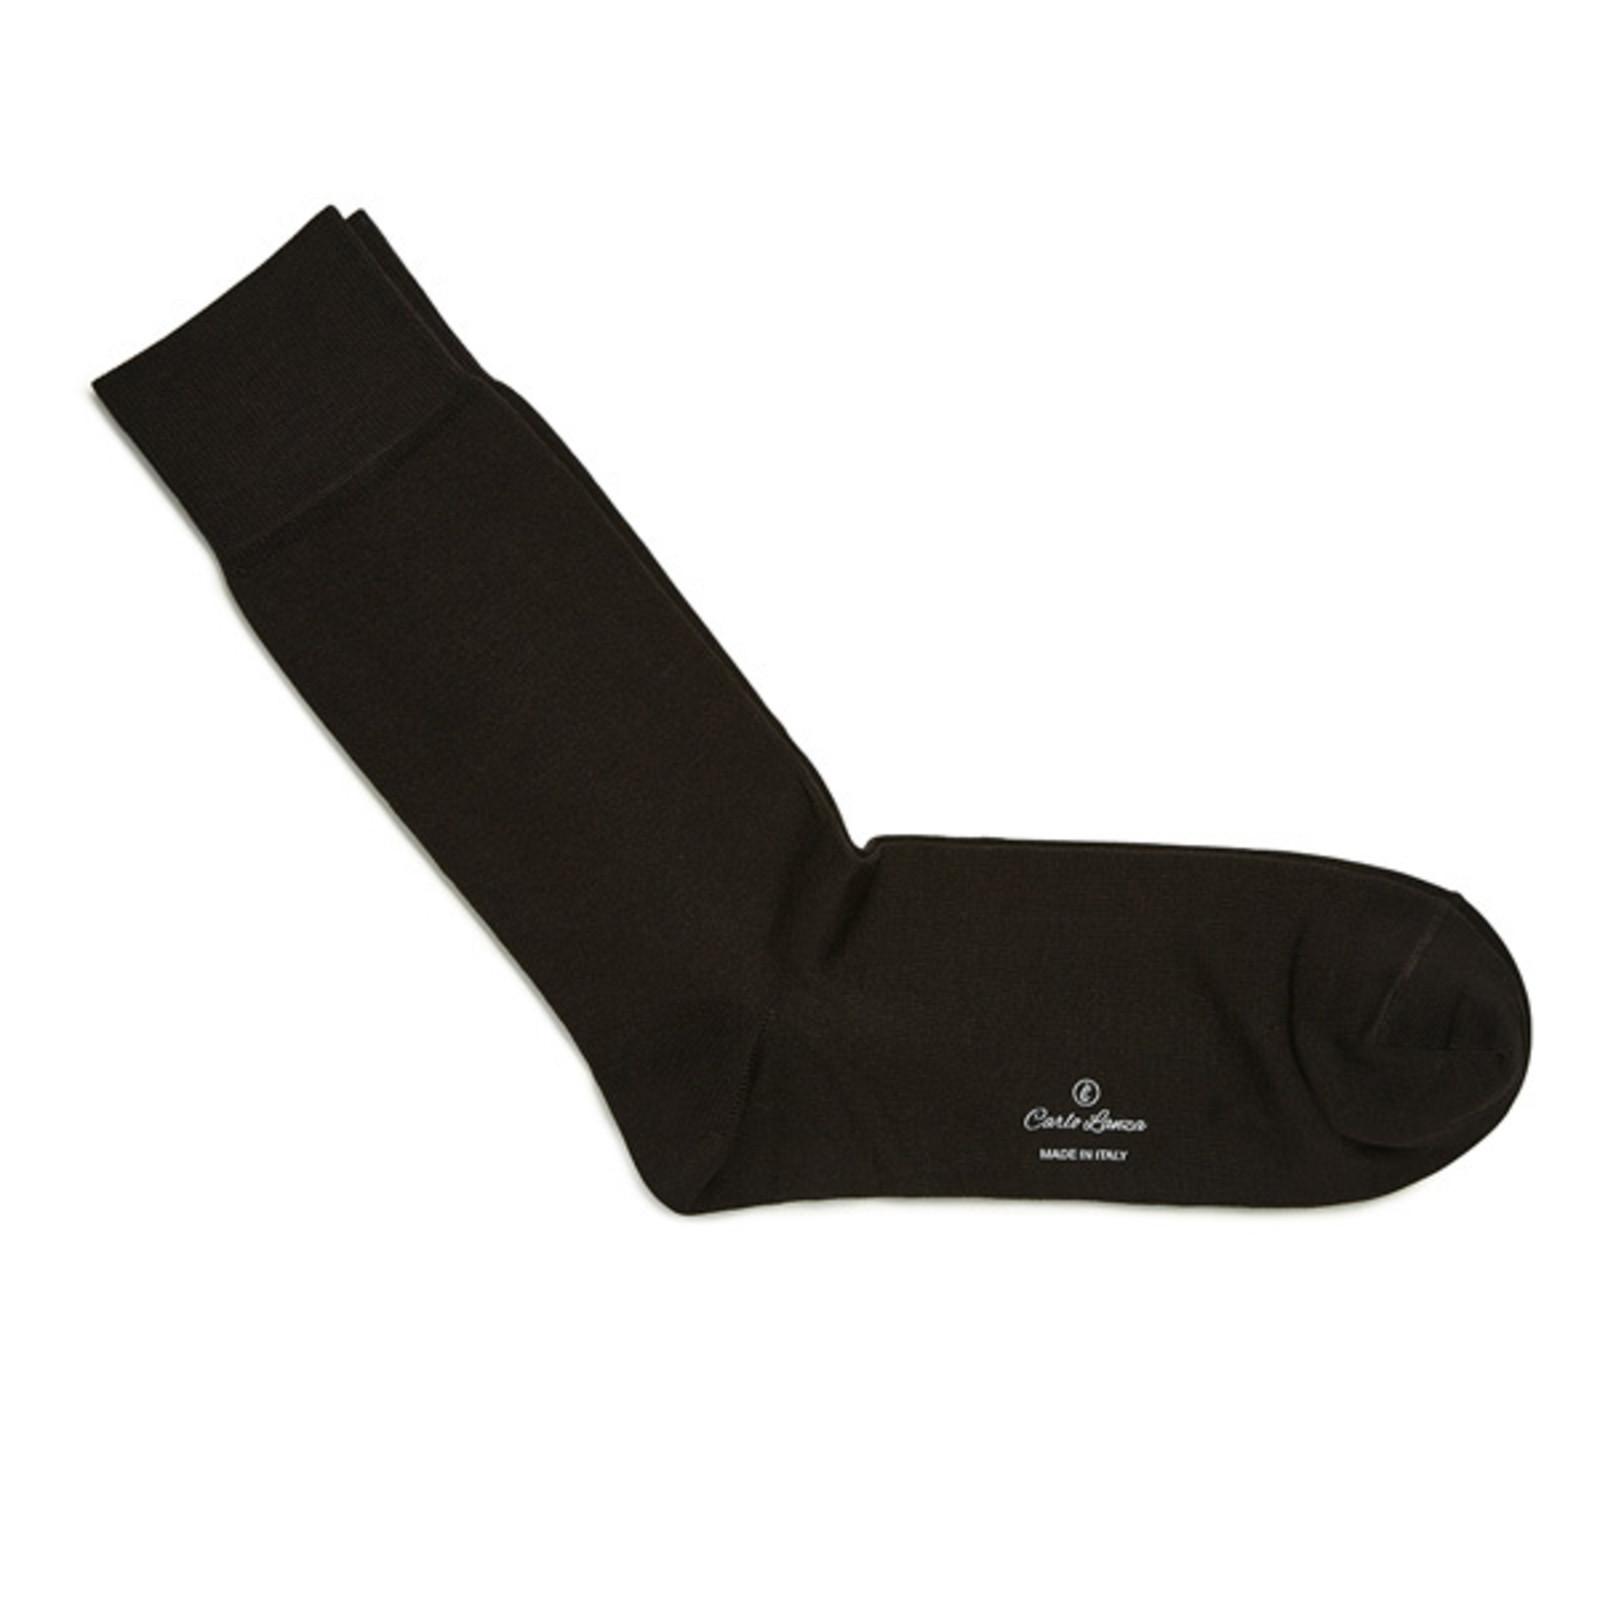 Carlo Lanza Donkerbruine katoenen sokken | Carlo Lanza